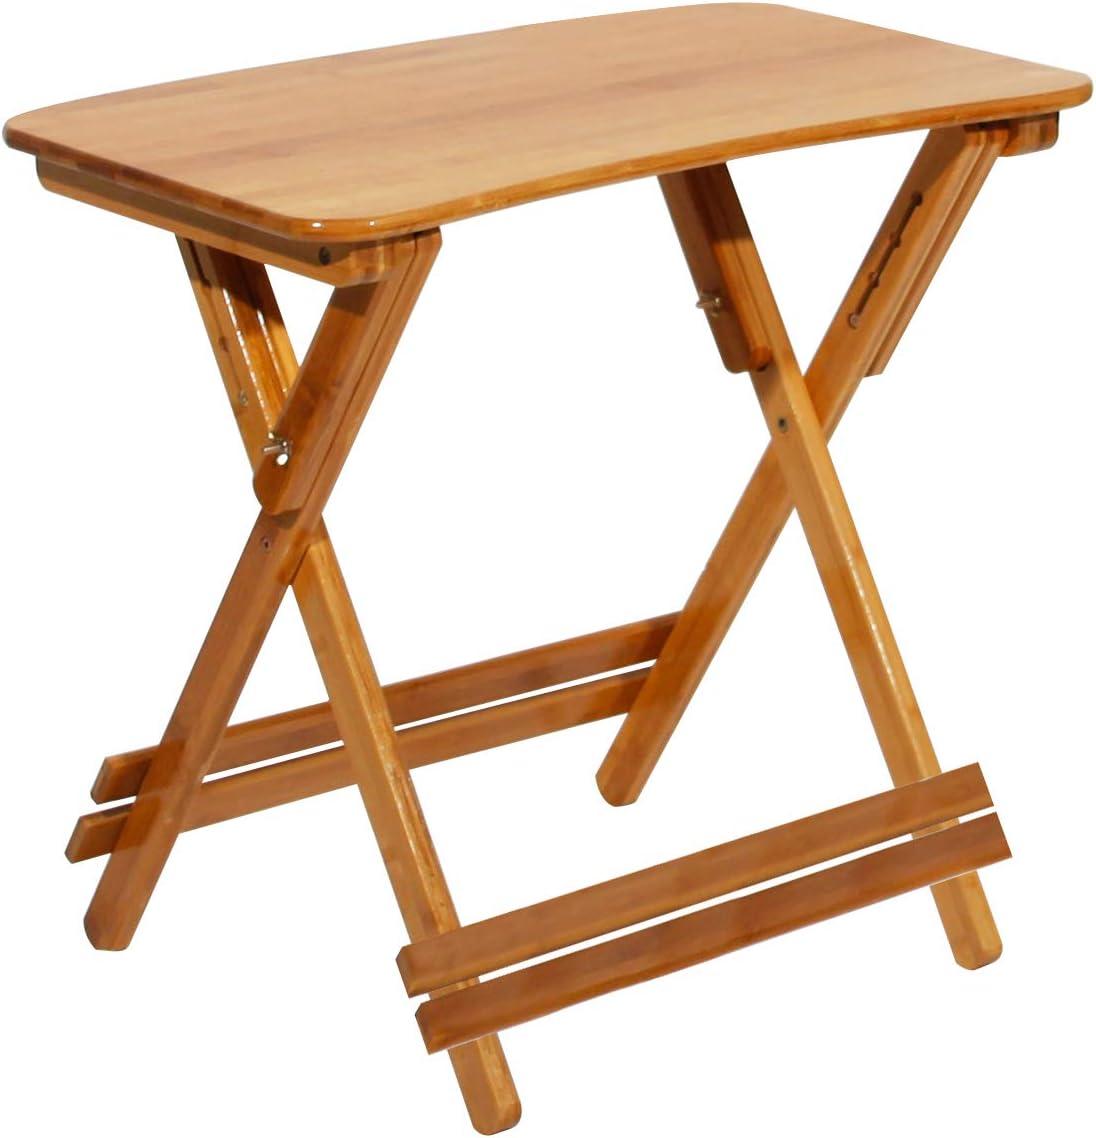 DlandHome Mesa de jardín Plegable pequeña 70 * 39 * 62-78 CM portátil Mesa de Cocina Plegable de Madera de bambú Plegable Mesa de Camping/Picnic/Pesca